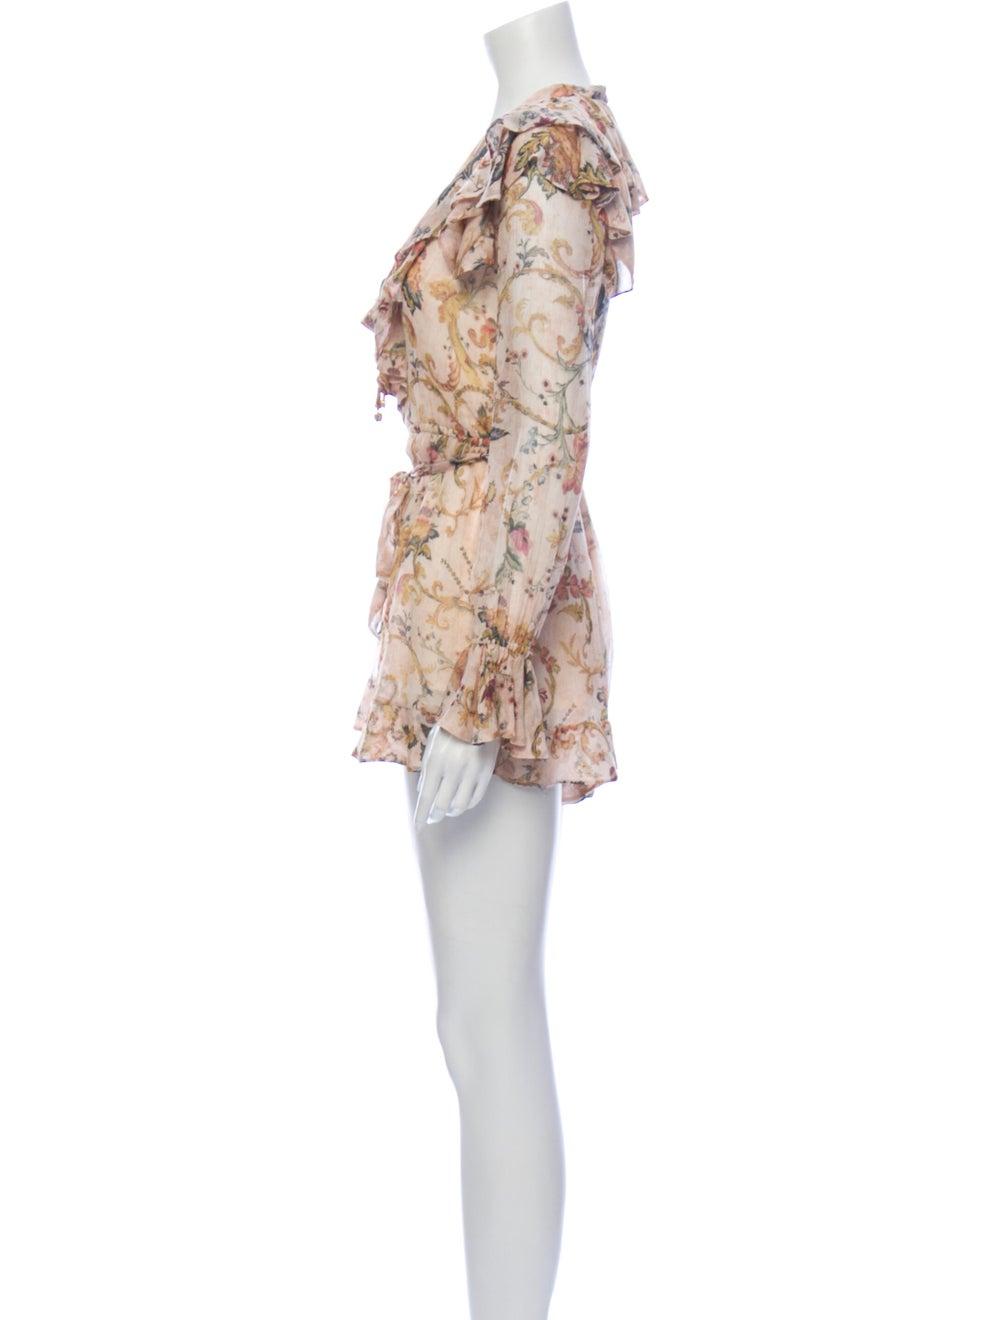 Zimmermann Silk Floral Print Romper - image 2